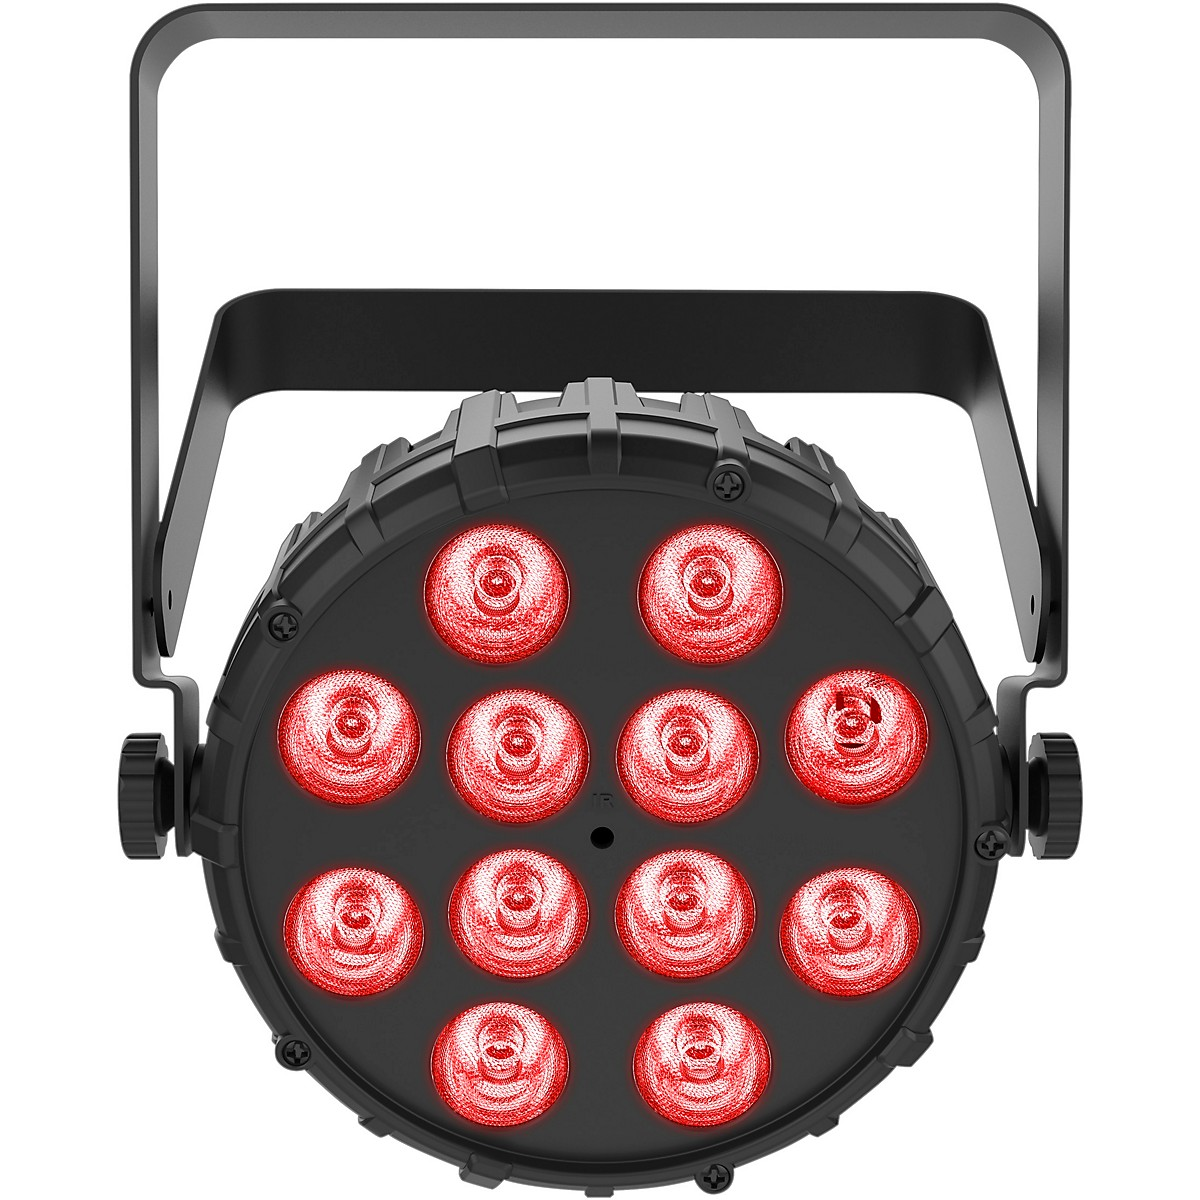 CHAUVET DJ SlimPAR Q12 BT LED Wash Light with Bluetooth